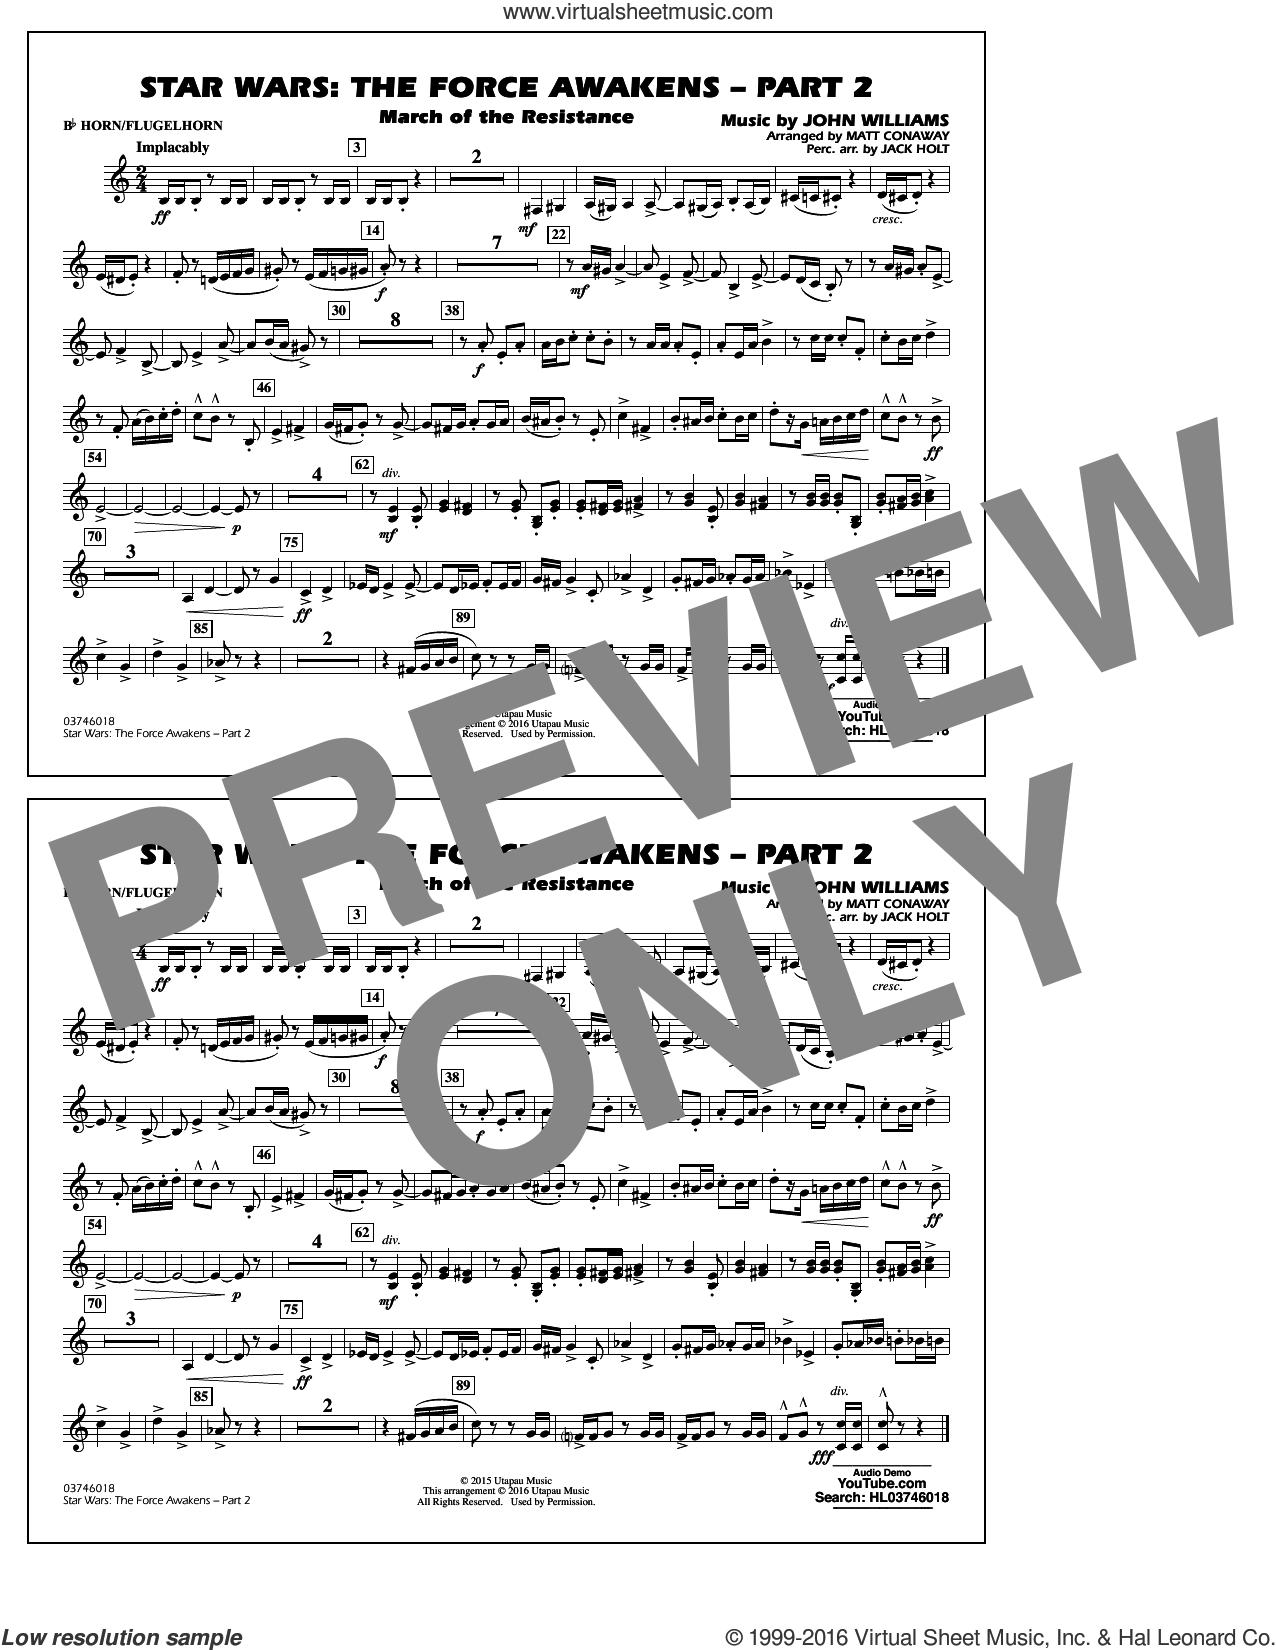 Star Wars: The Force Awakens, part 2 sheet music for marching band (Bb horn/flugelhorn) by John Williams and Matt Conaway, classical score, intermediate skill level